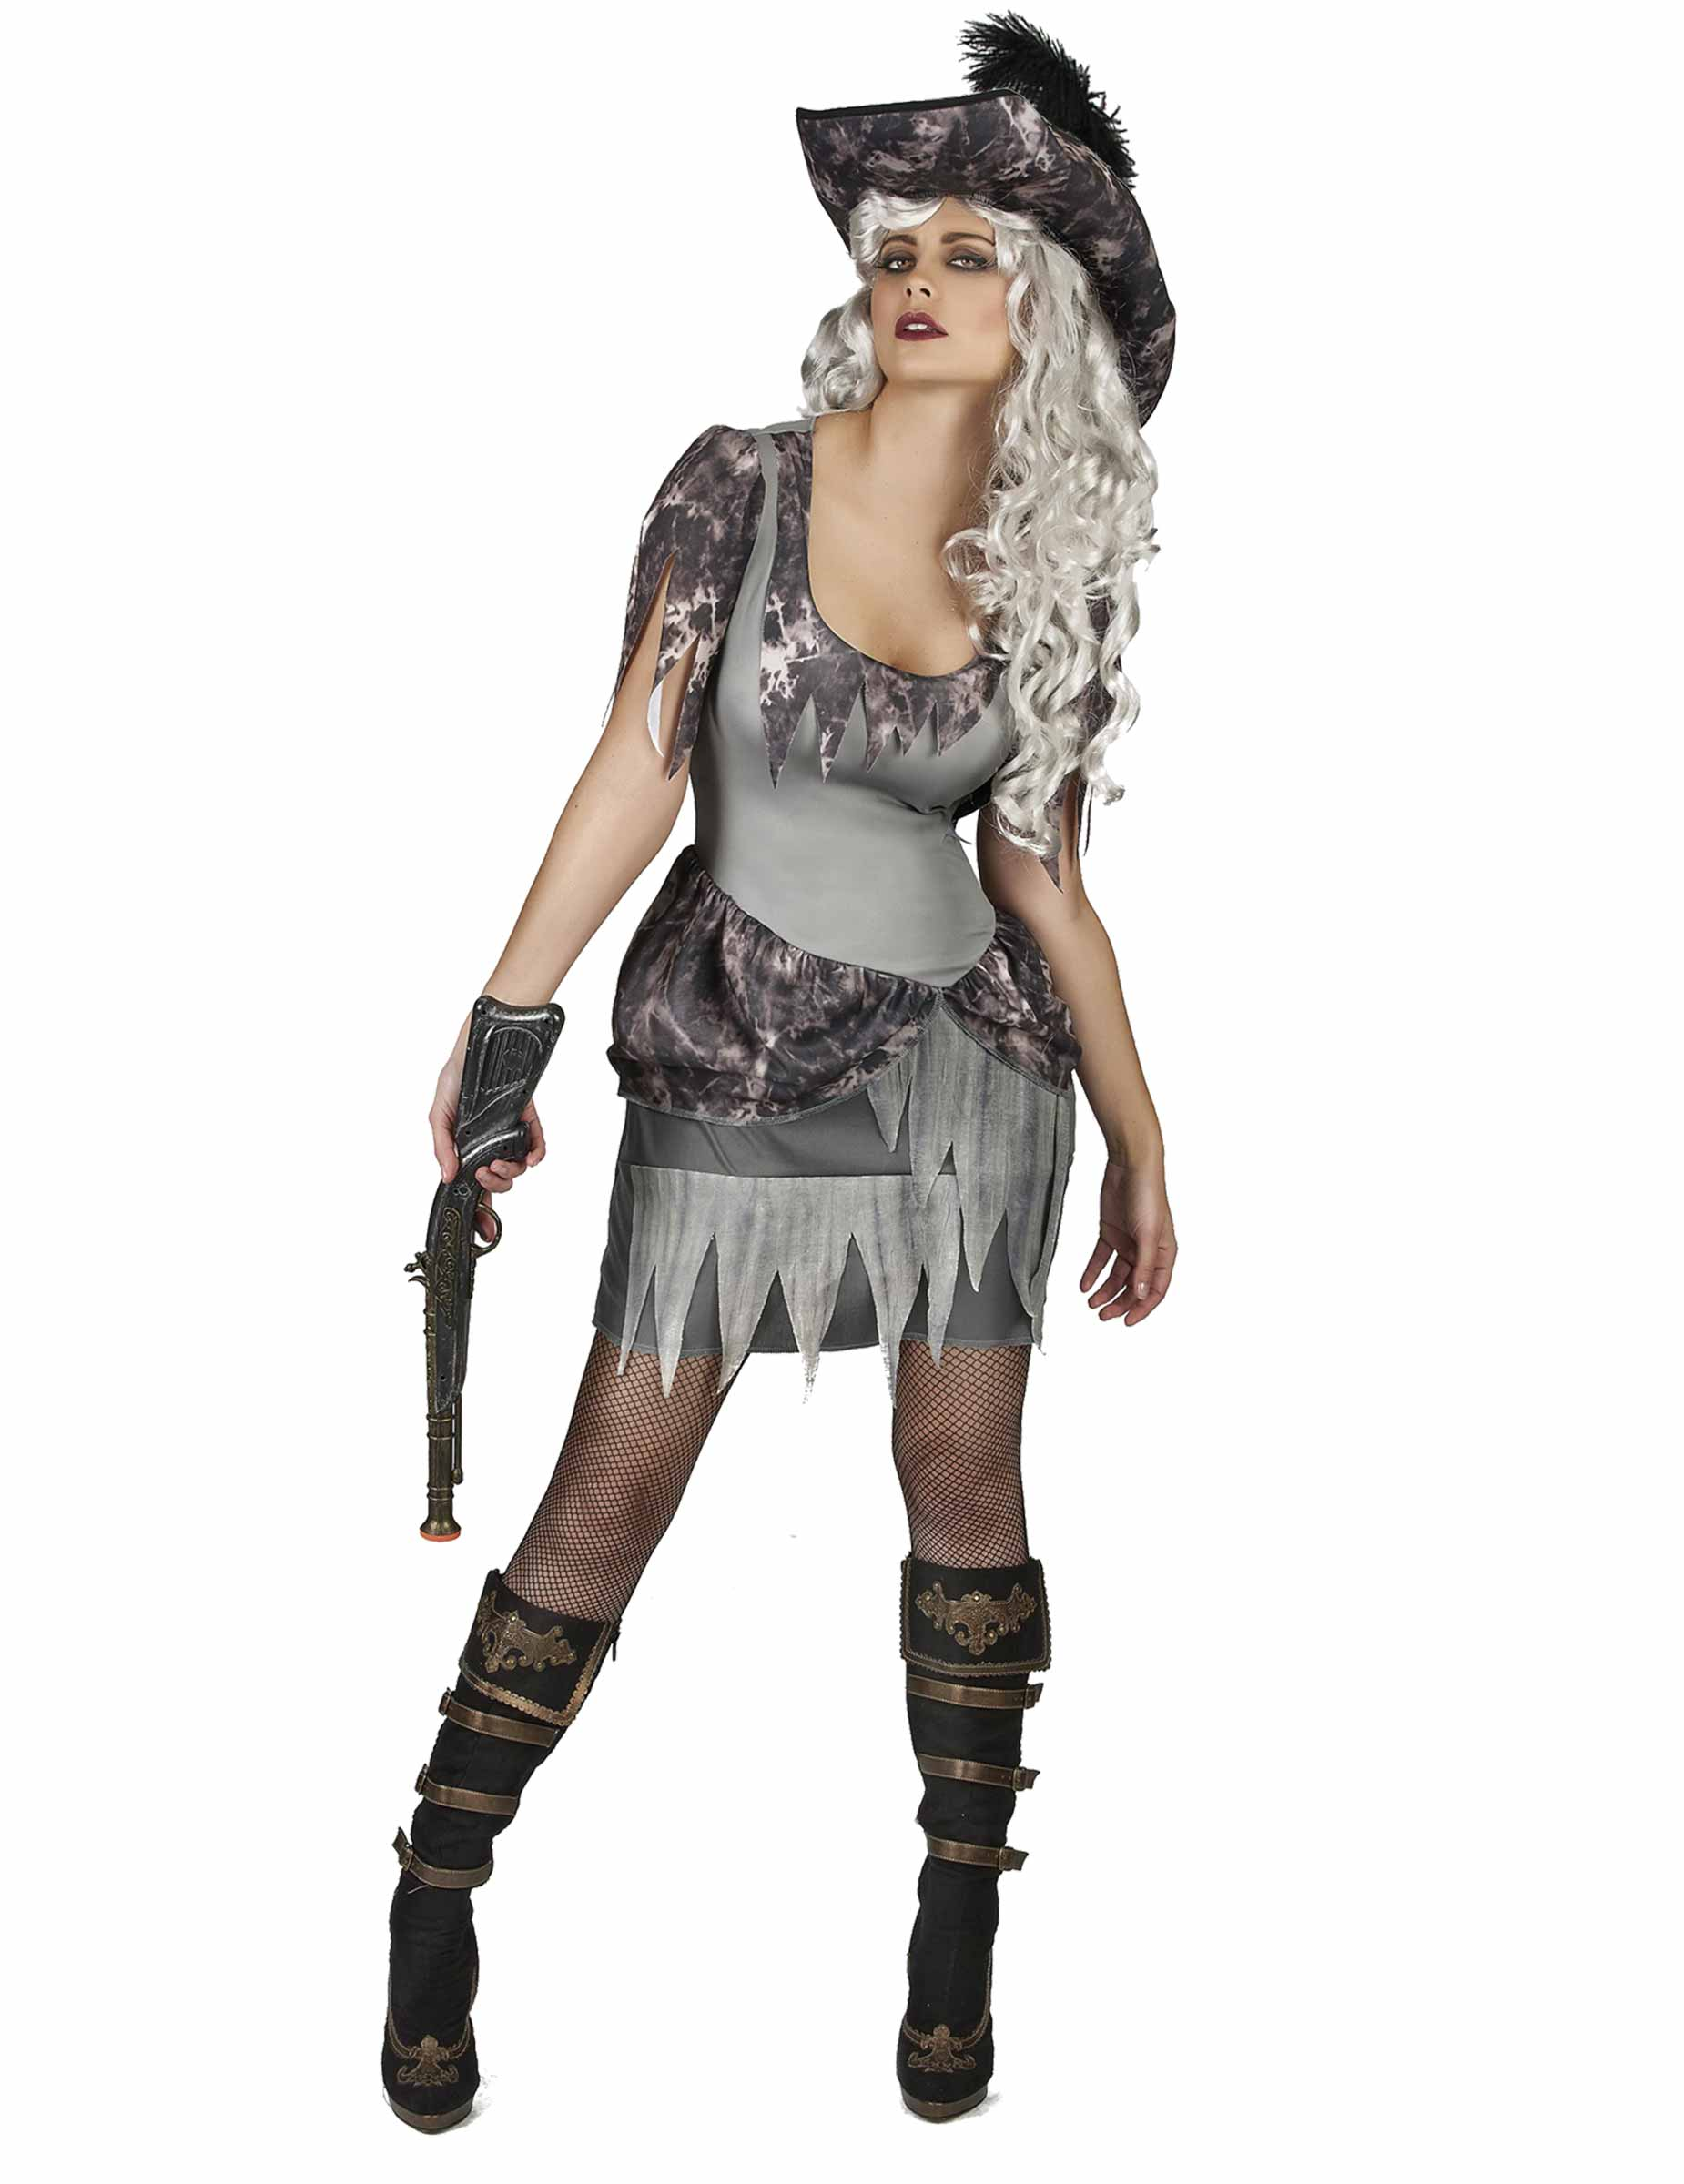 D guisement pirate fant me grise femme deguise toi - Pirate fantome ...